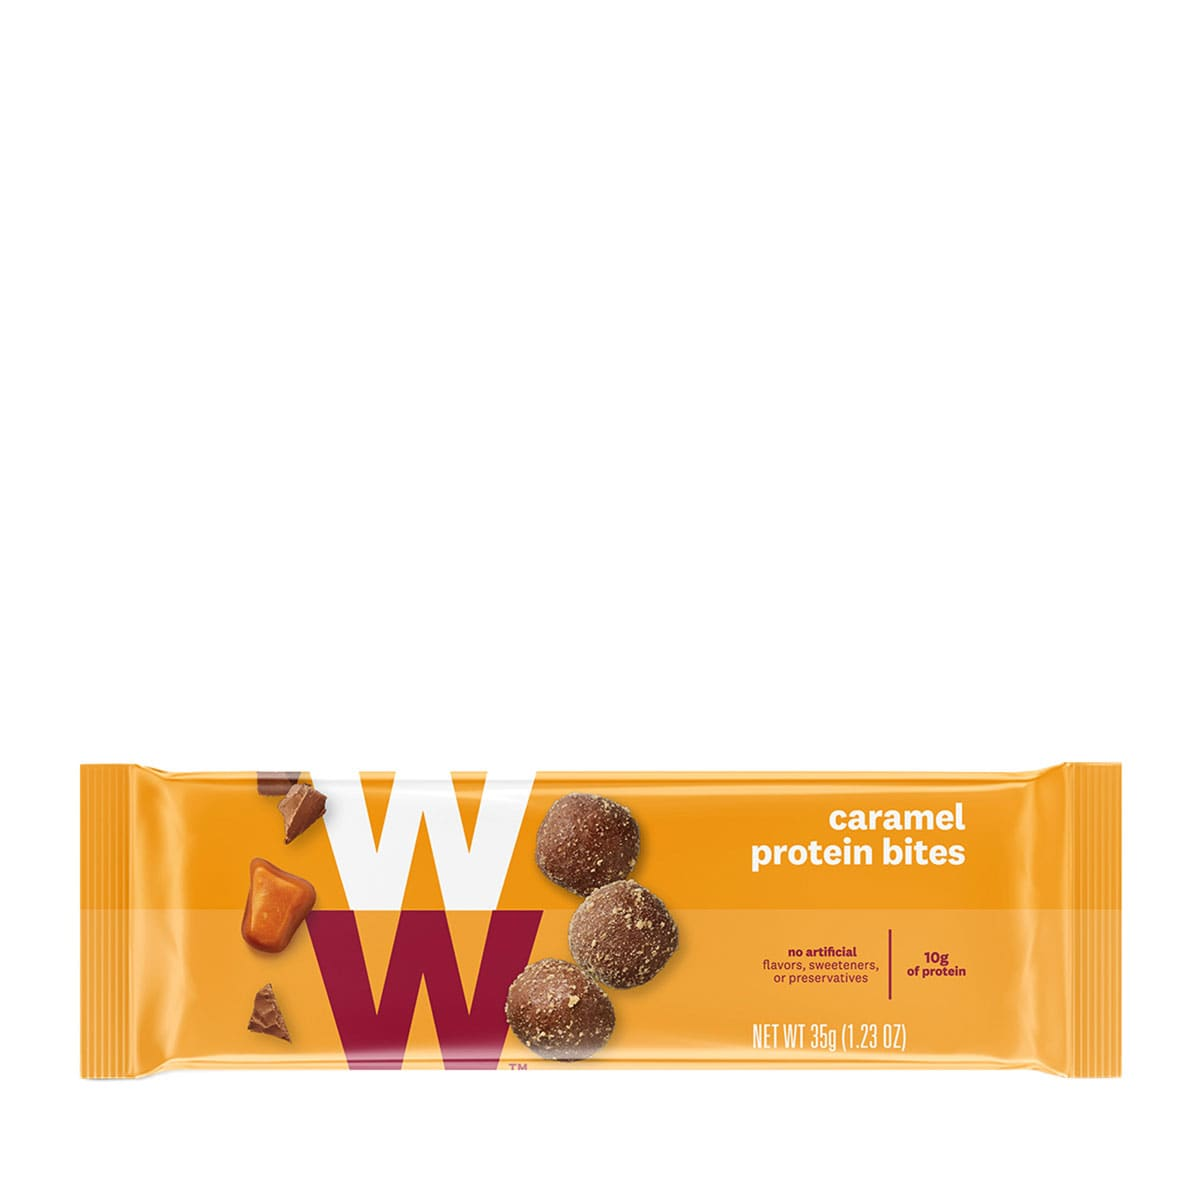 Caramel Protein Bites - front of pack, 3 bites per pack